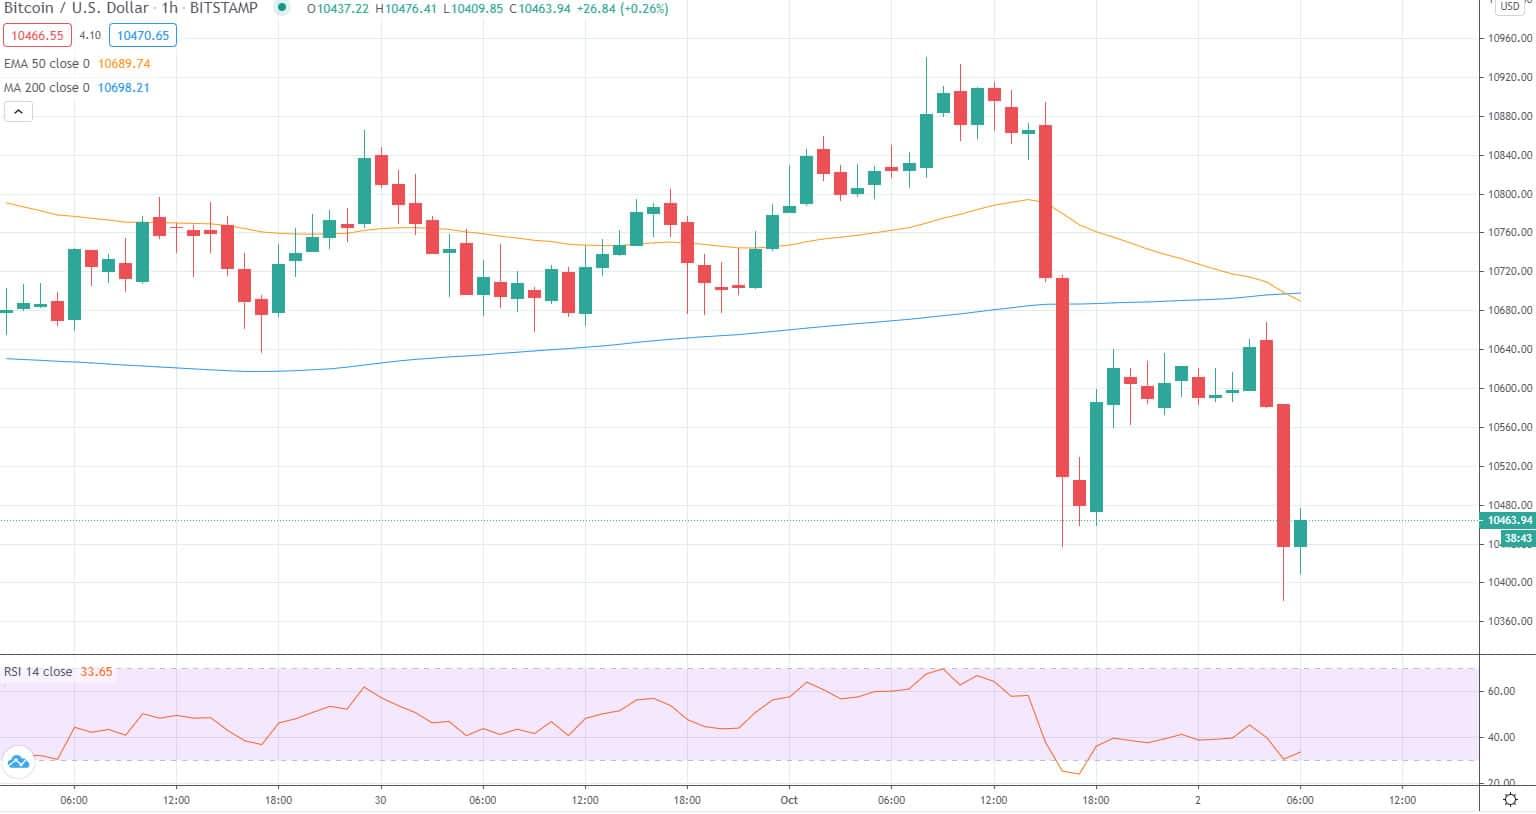 BTC fiyatı - tradingview.com